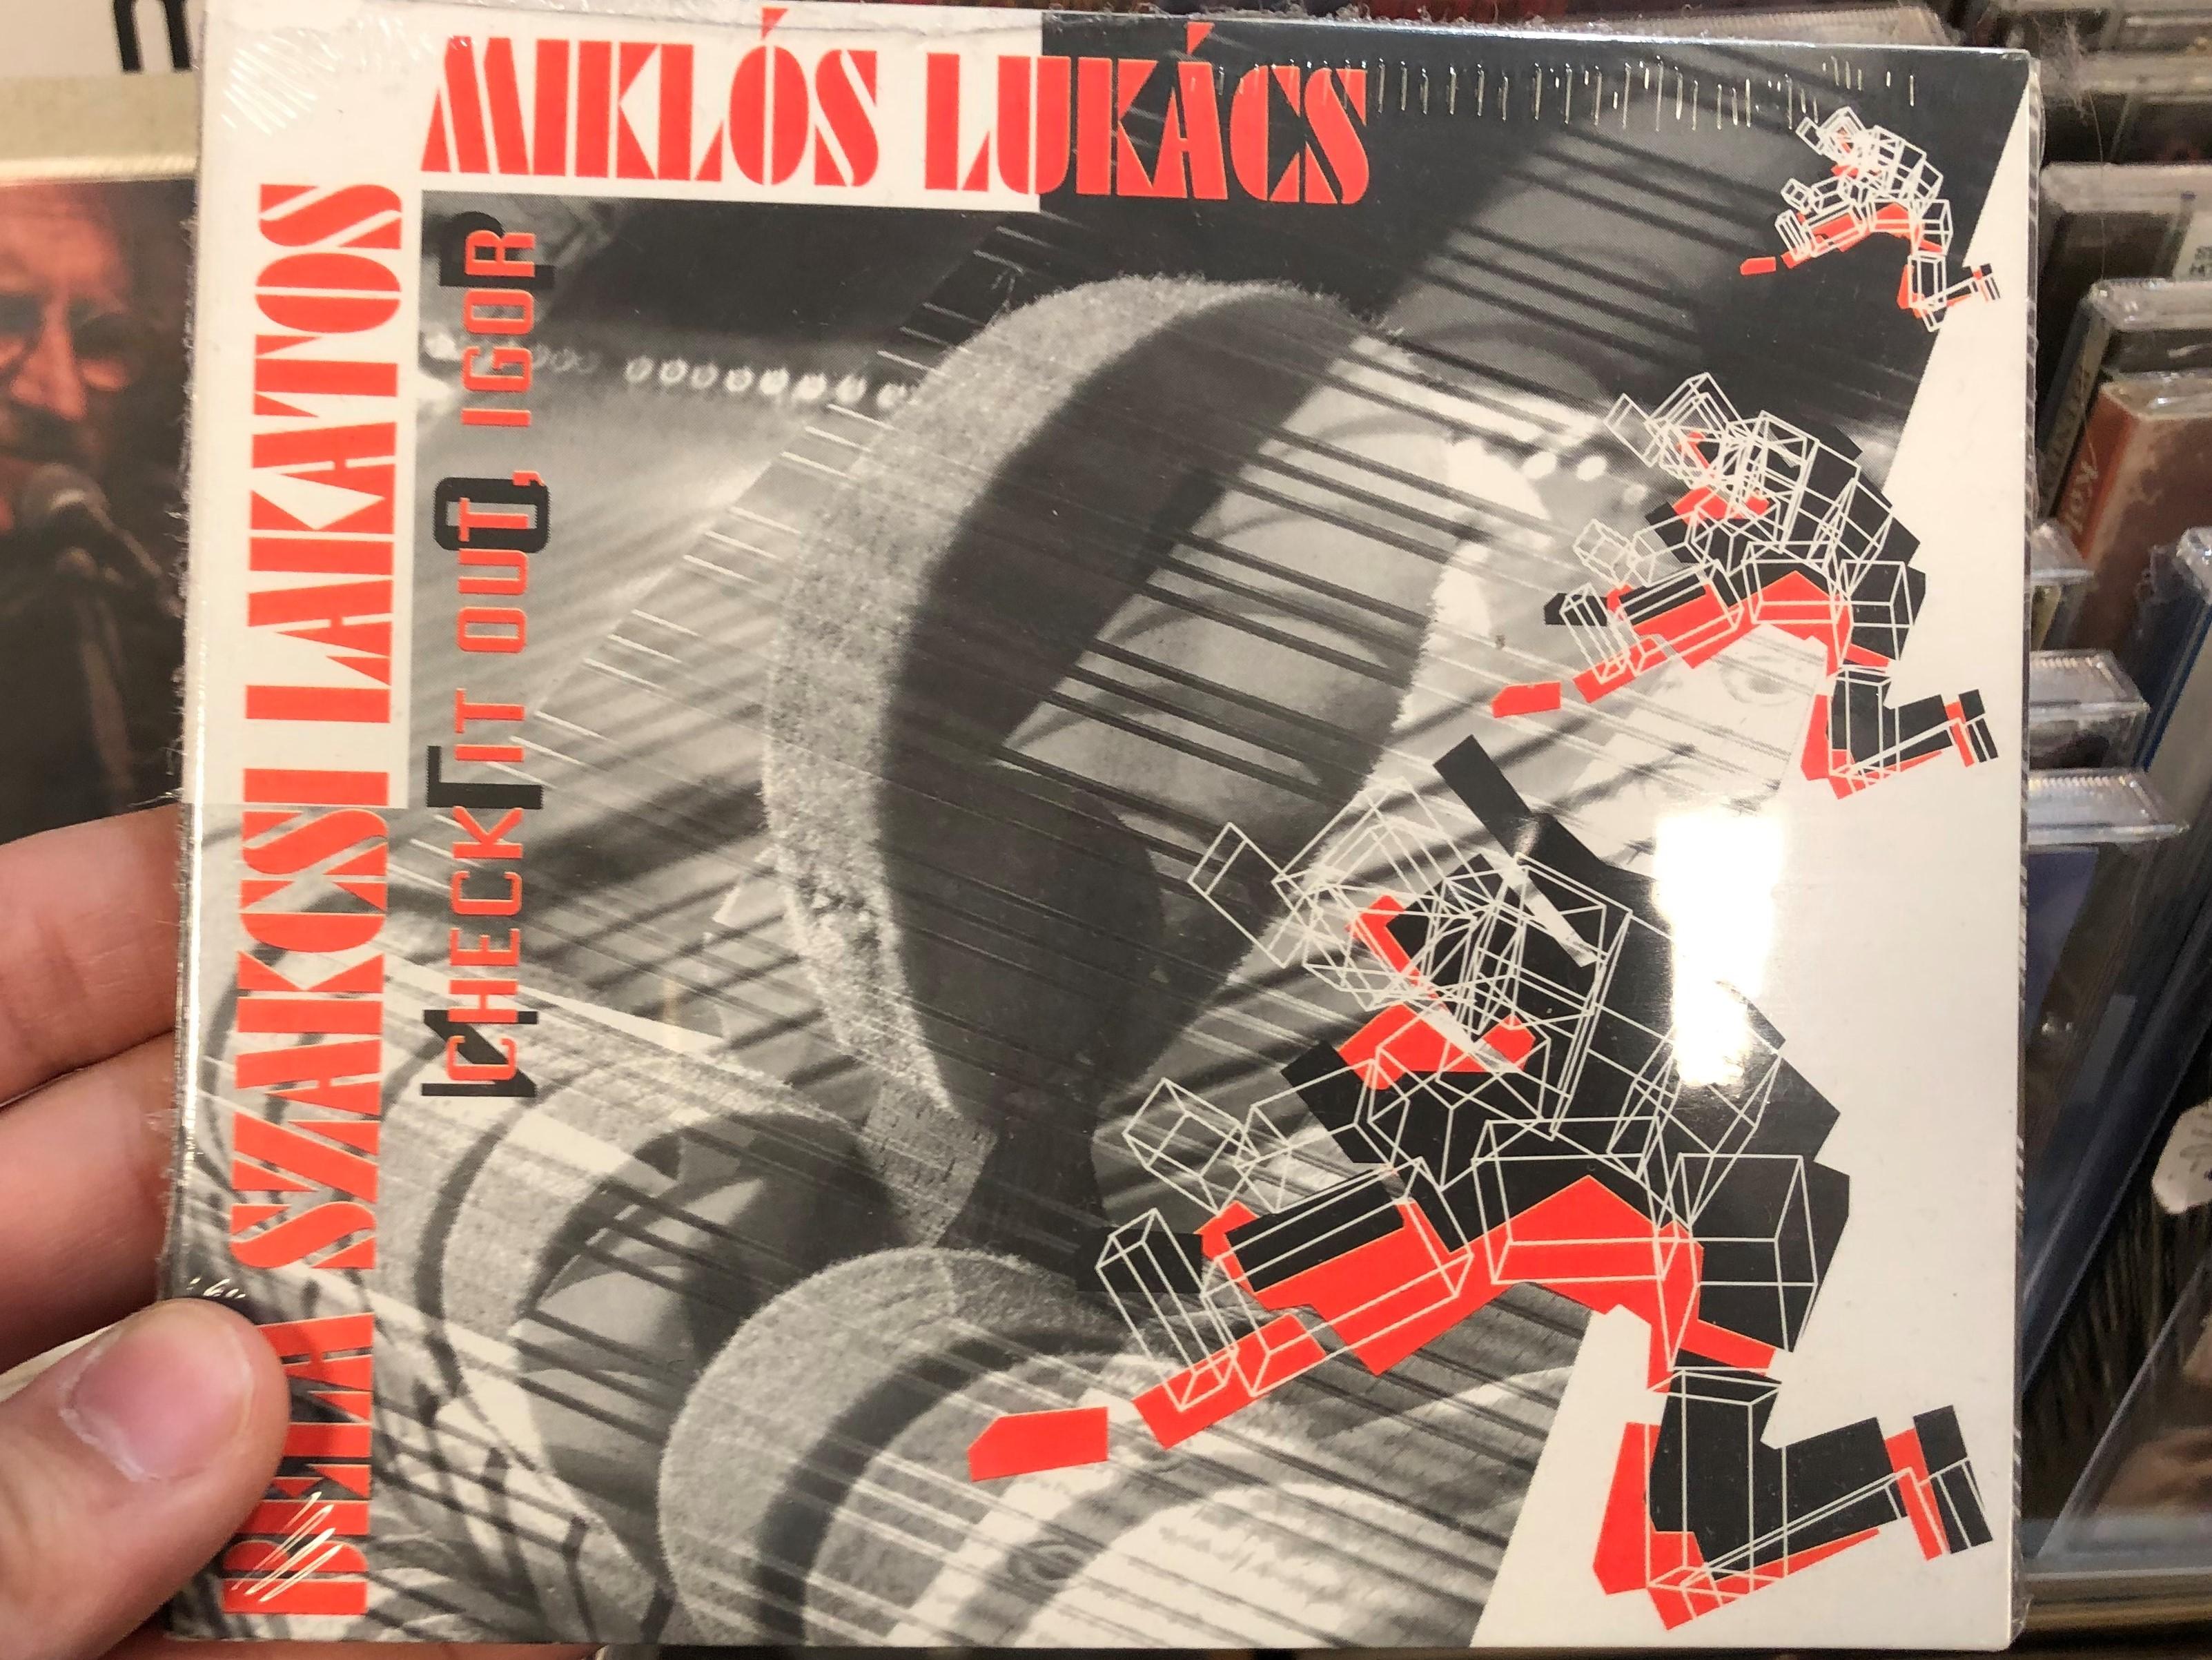 b-la-szakcsi-lakatos-mikl-s-luk-cs-check-it-out-igor-budapest-music-center-records-audio-cd-2005-bmc-cd-108-1-.jpg